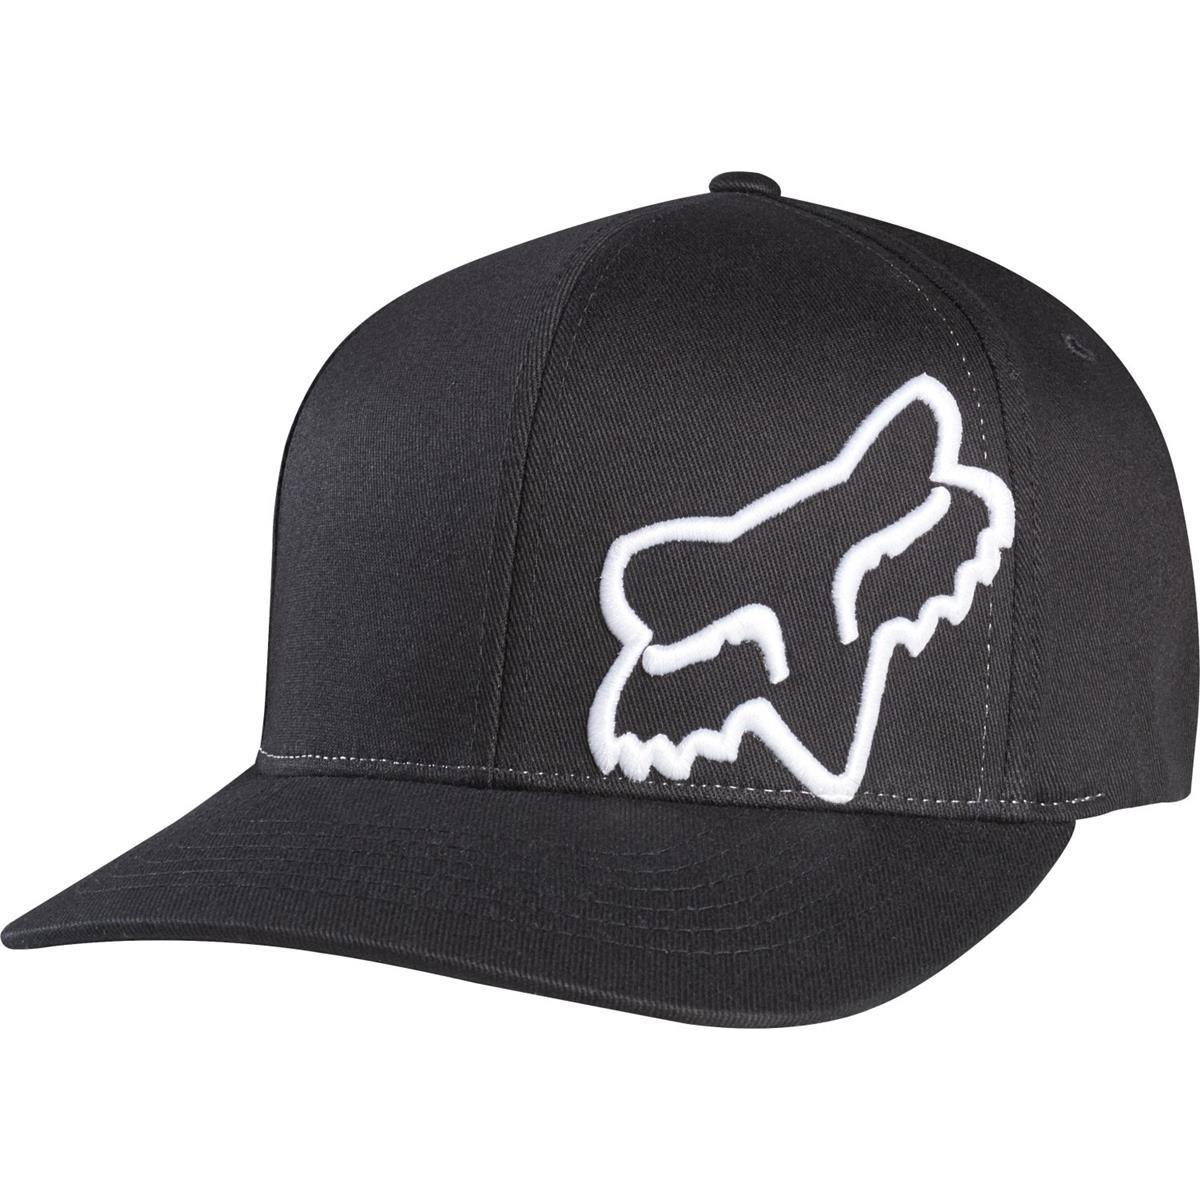 701538e30c3 Fox Flexfit Cap Flex 45 Black White